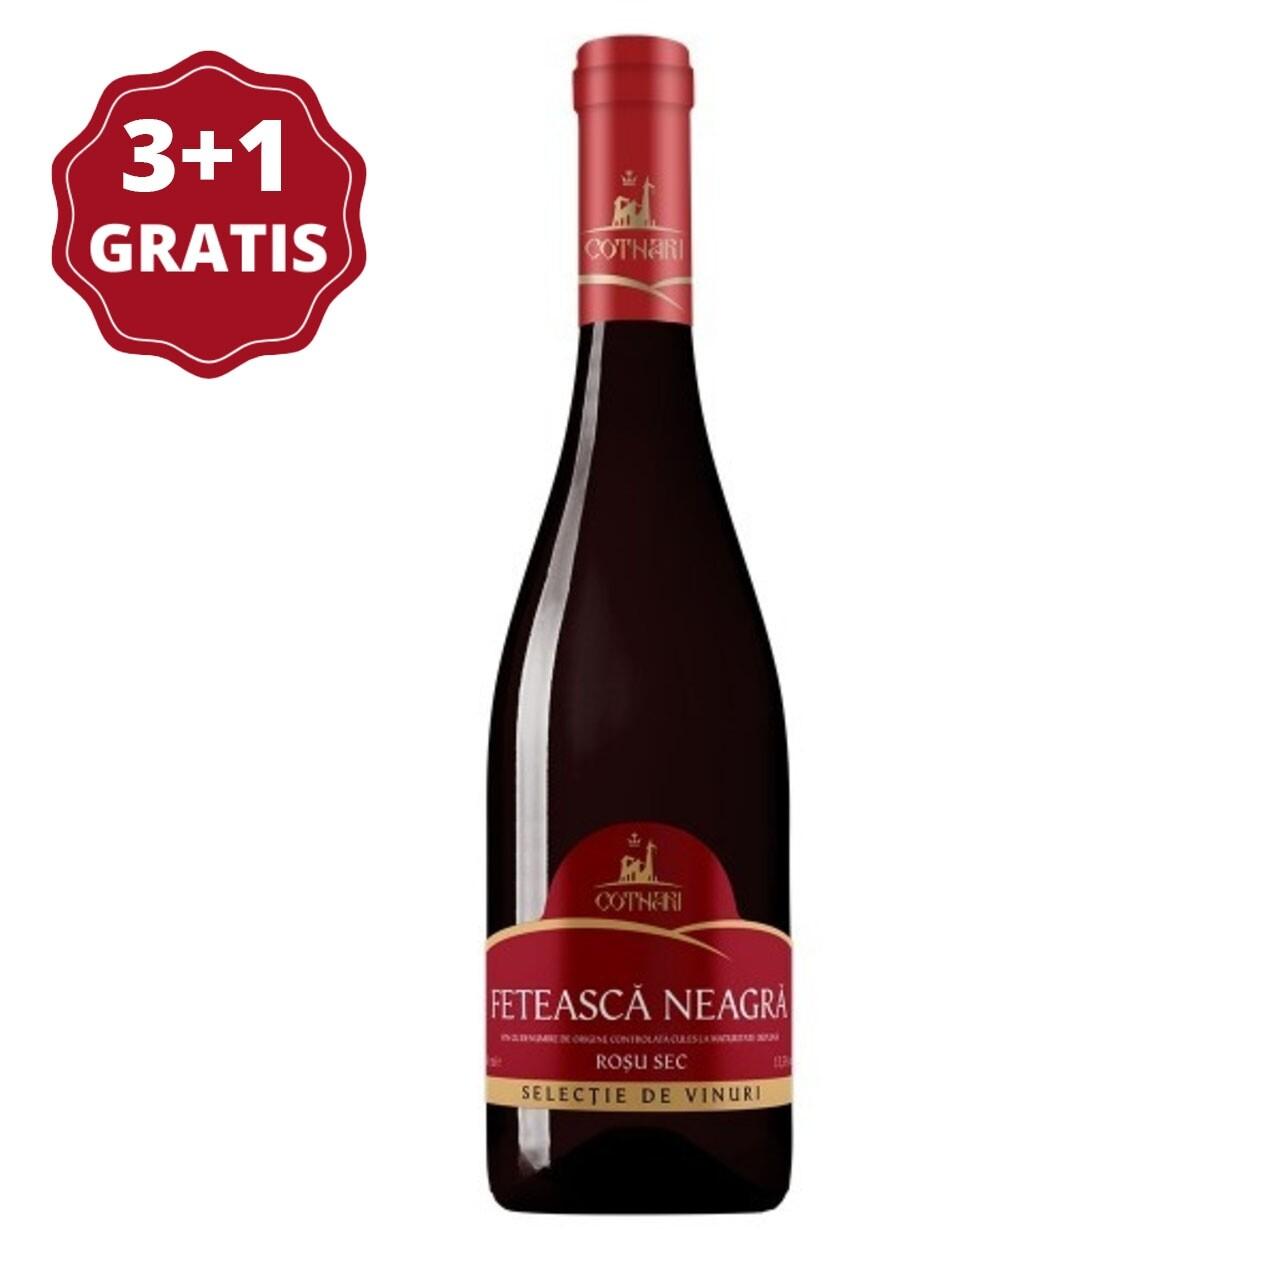 Cotnari Selectie Feteasca Neagra 3+1